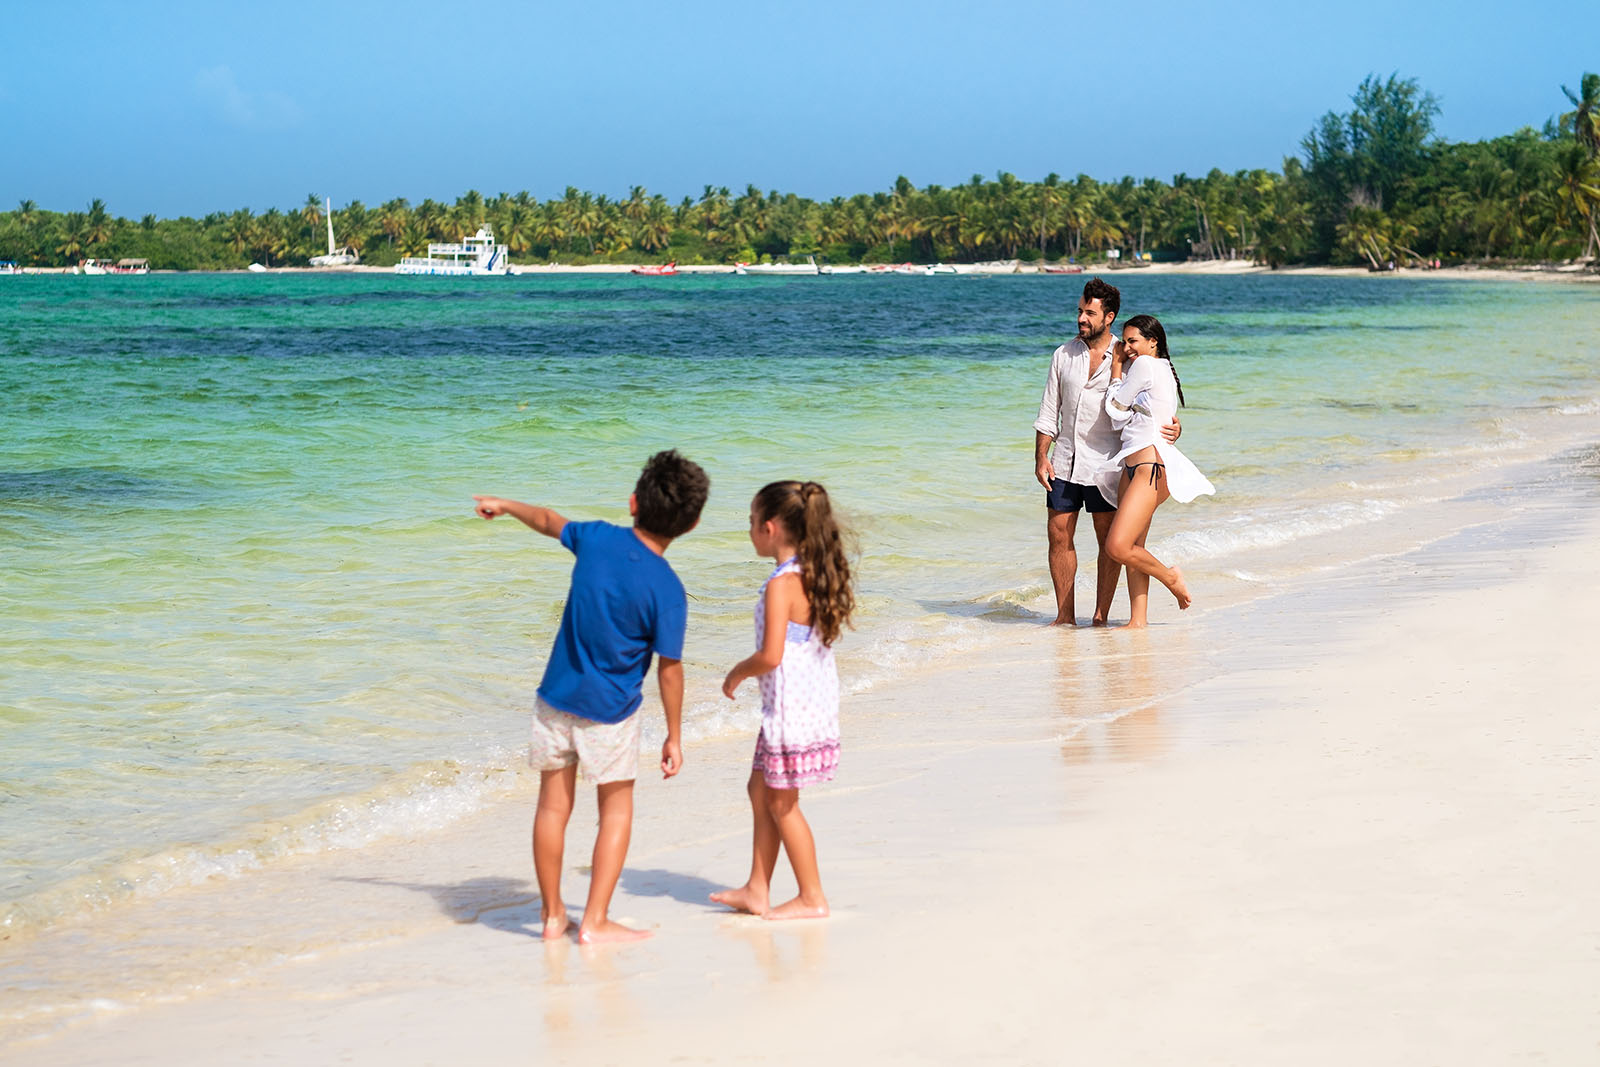 When in Punta Cana